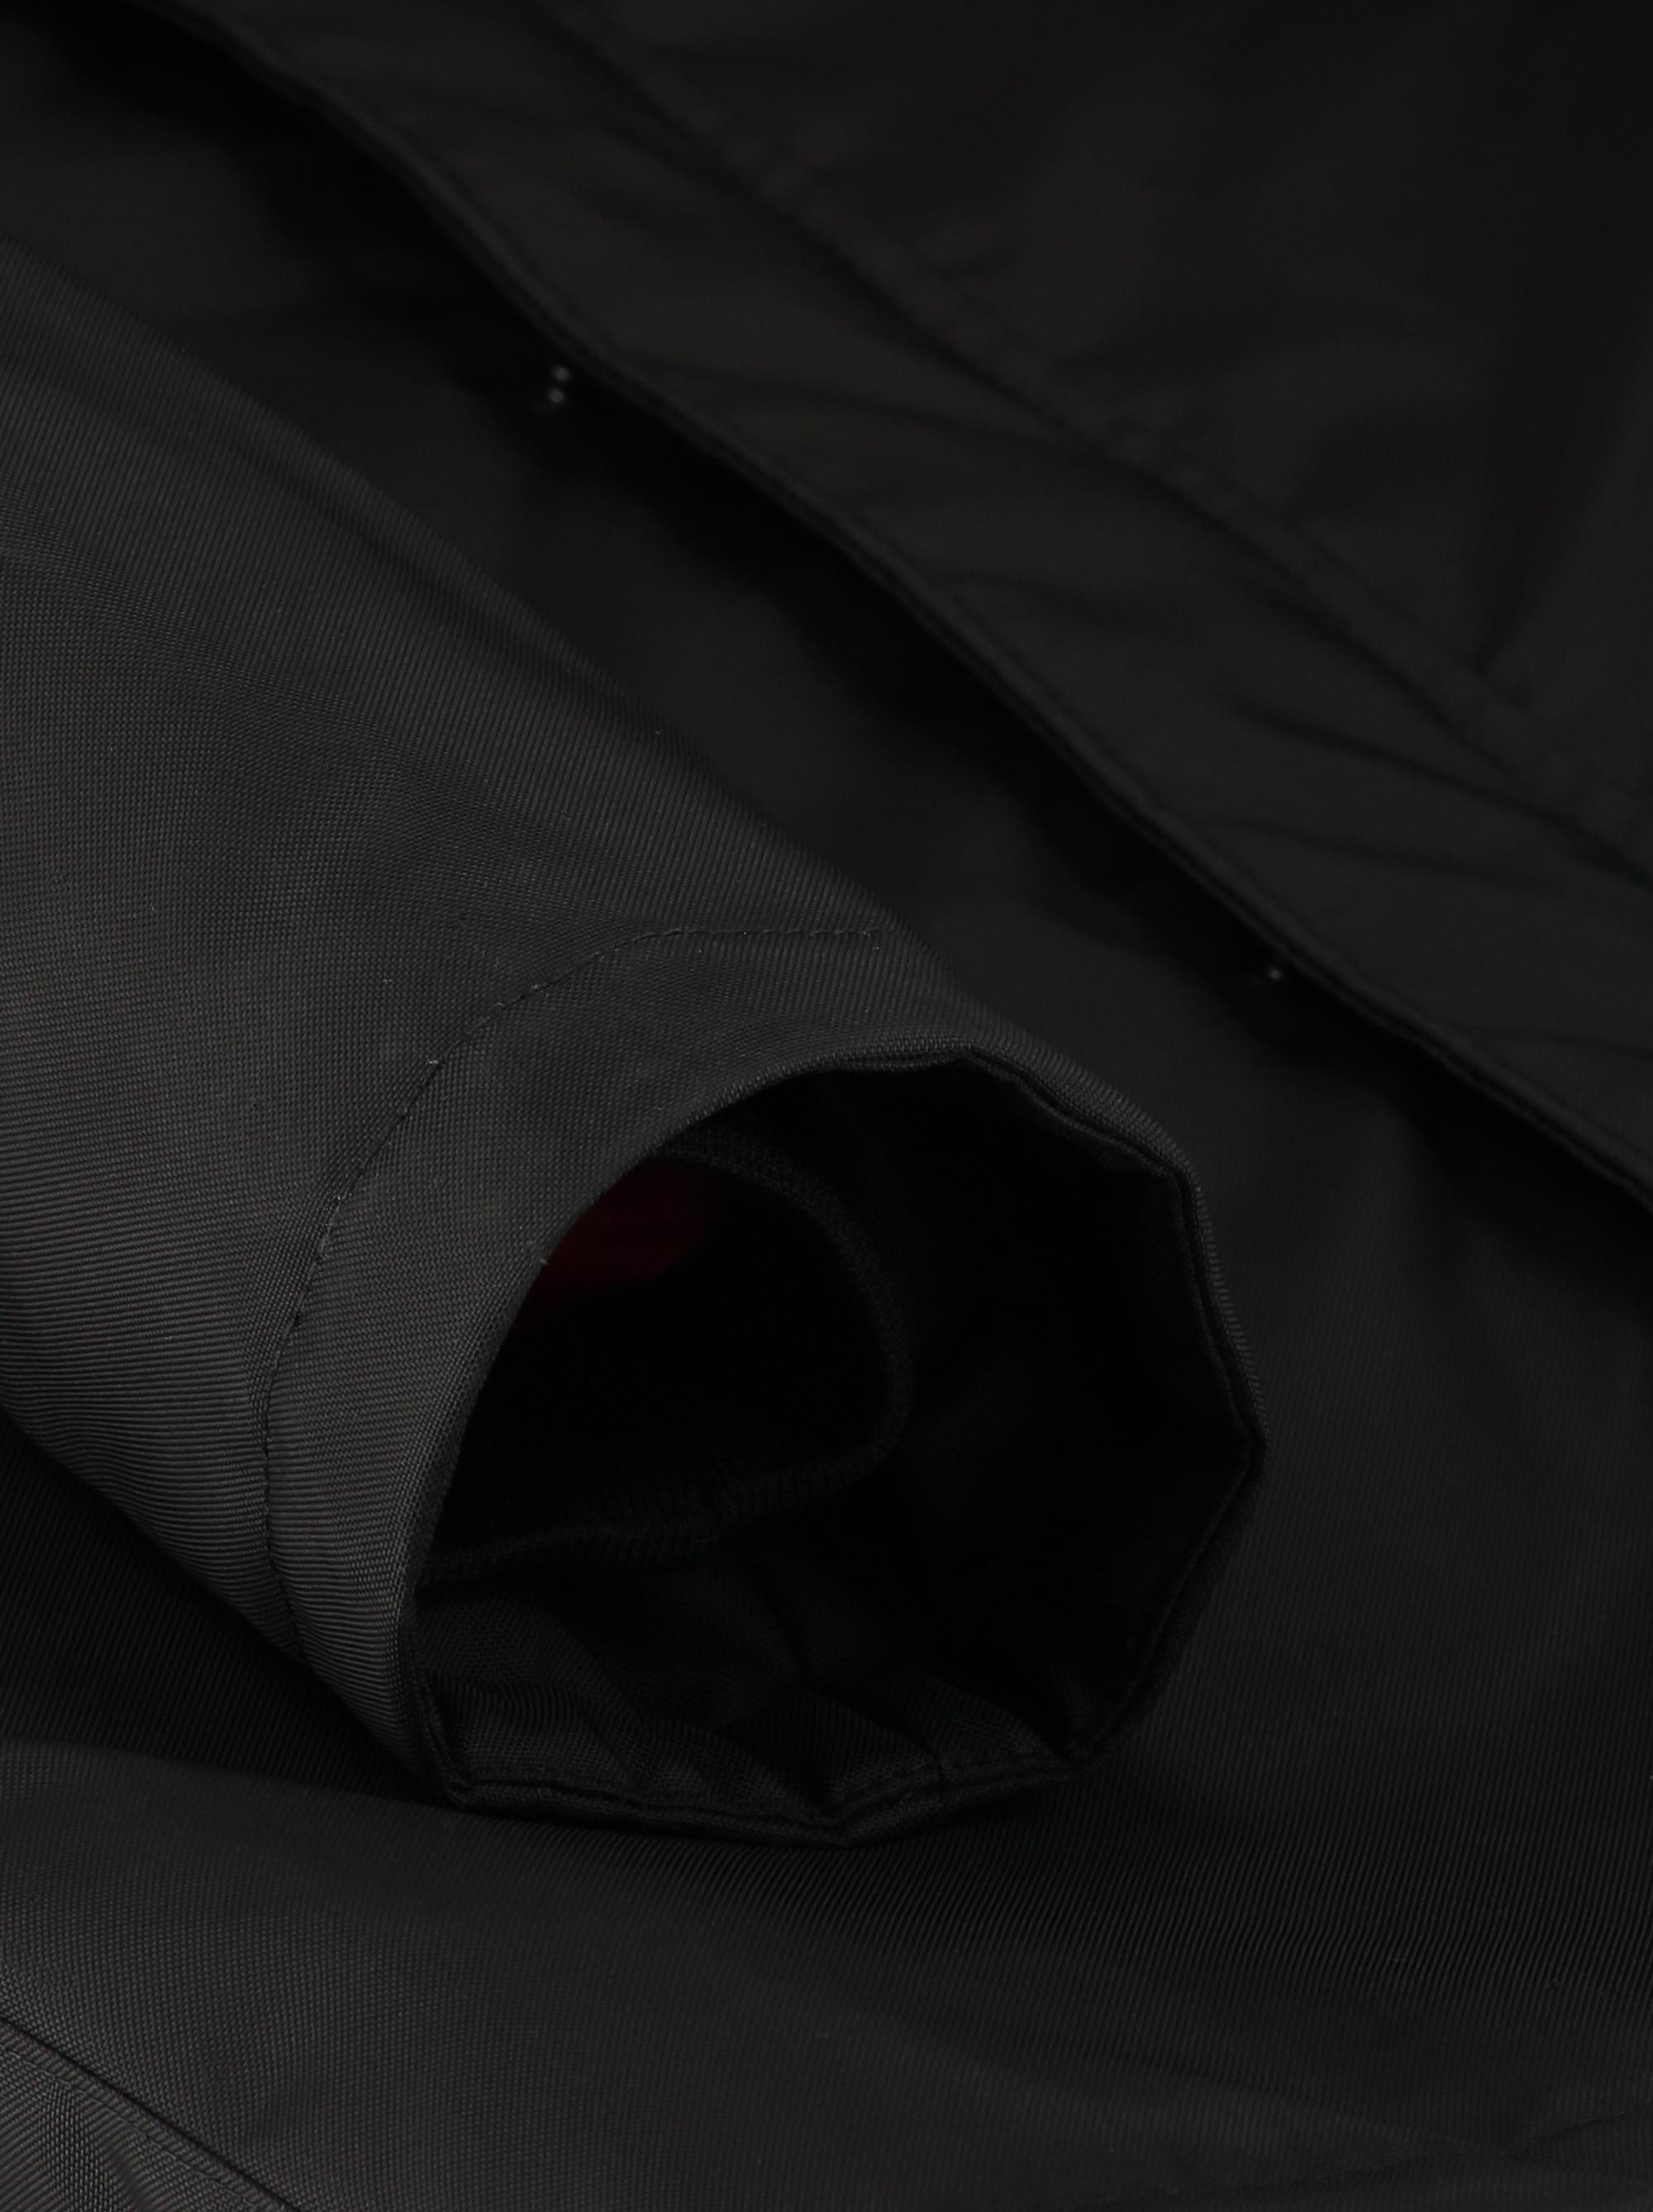 Teym_ParkaMatte_Black Orange_Men_detail3